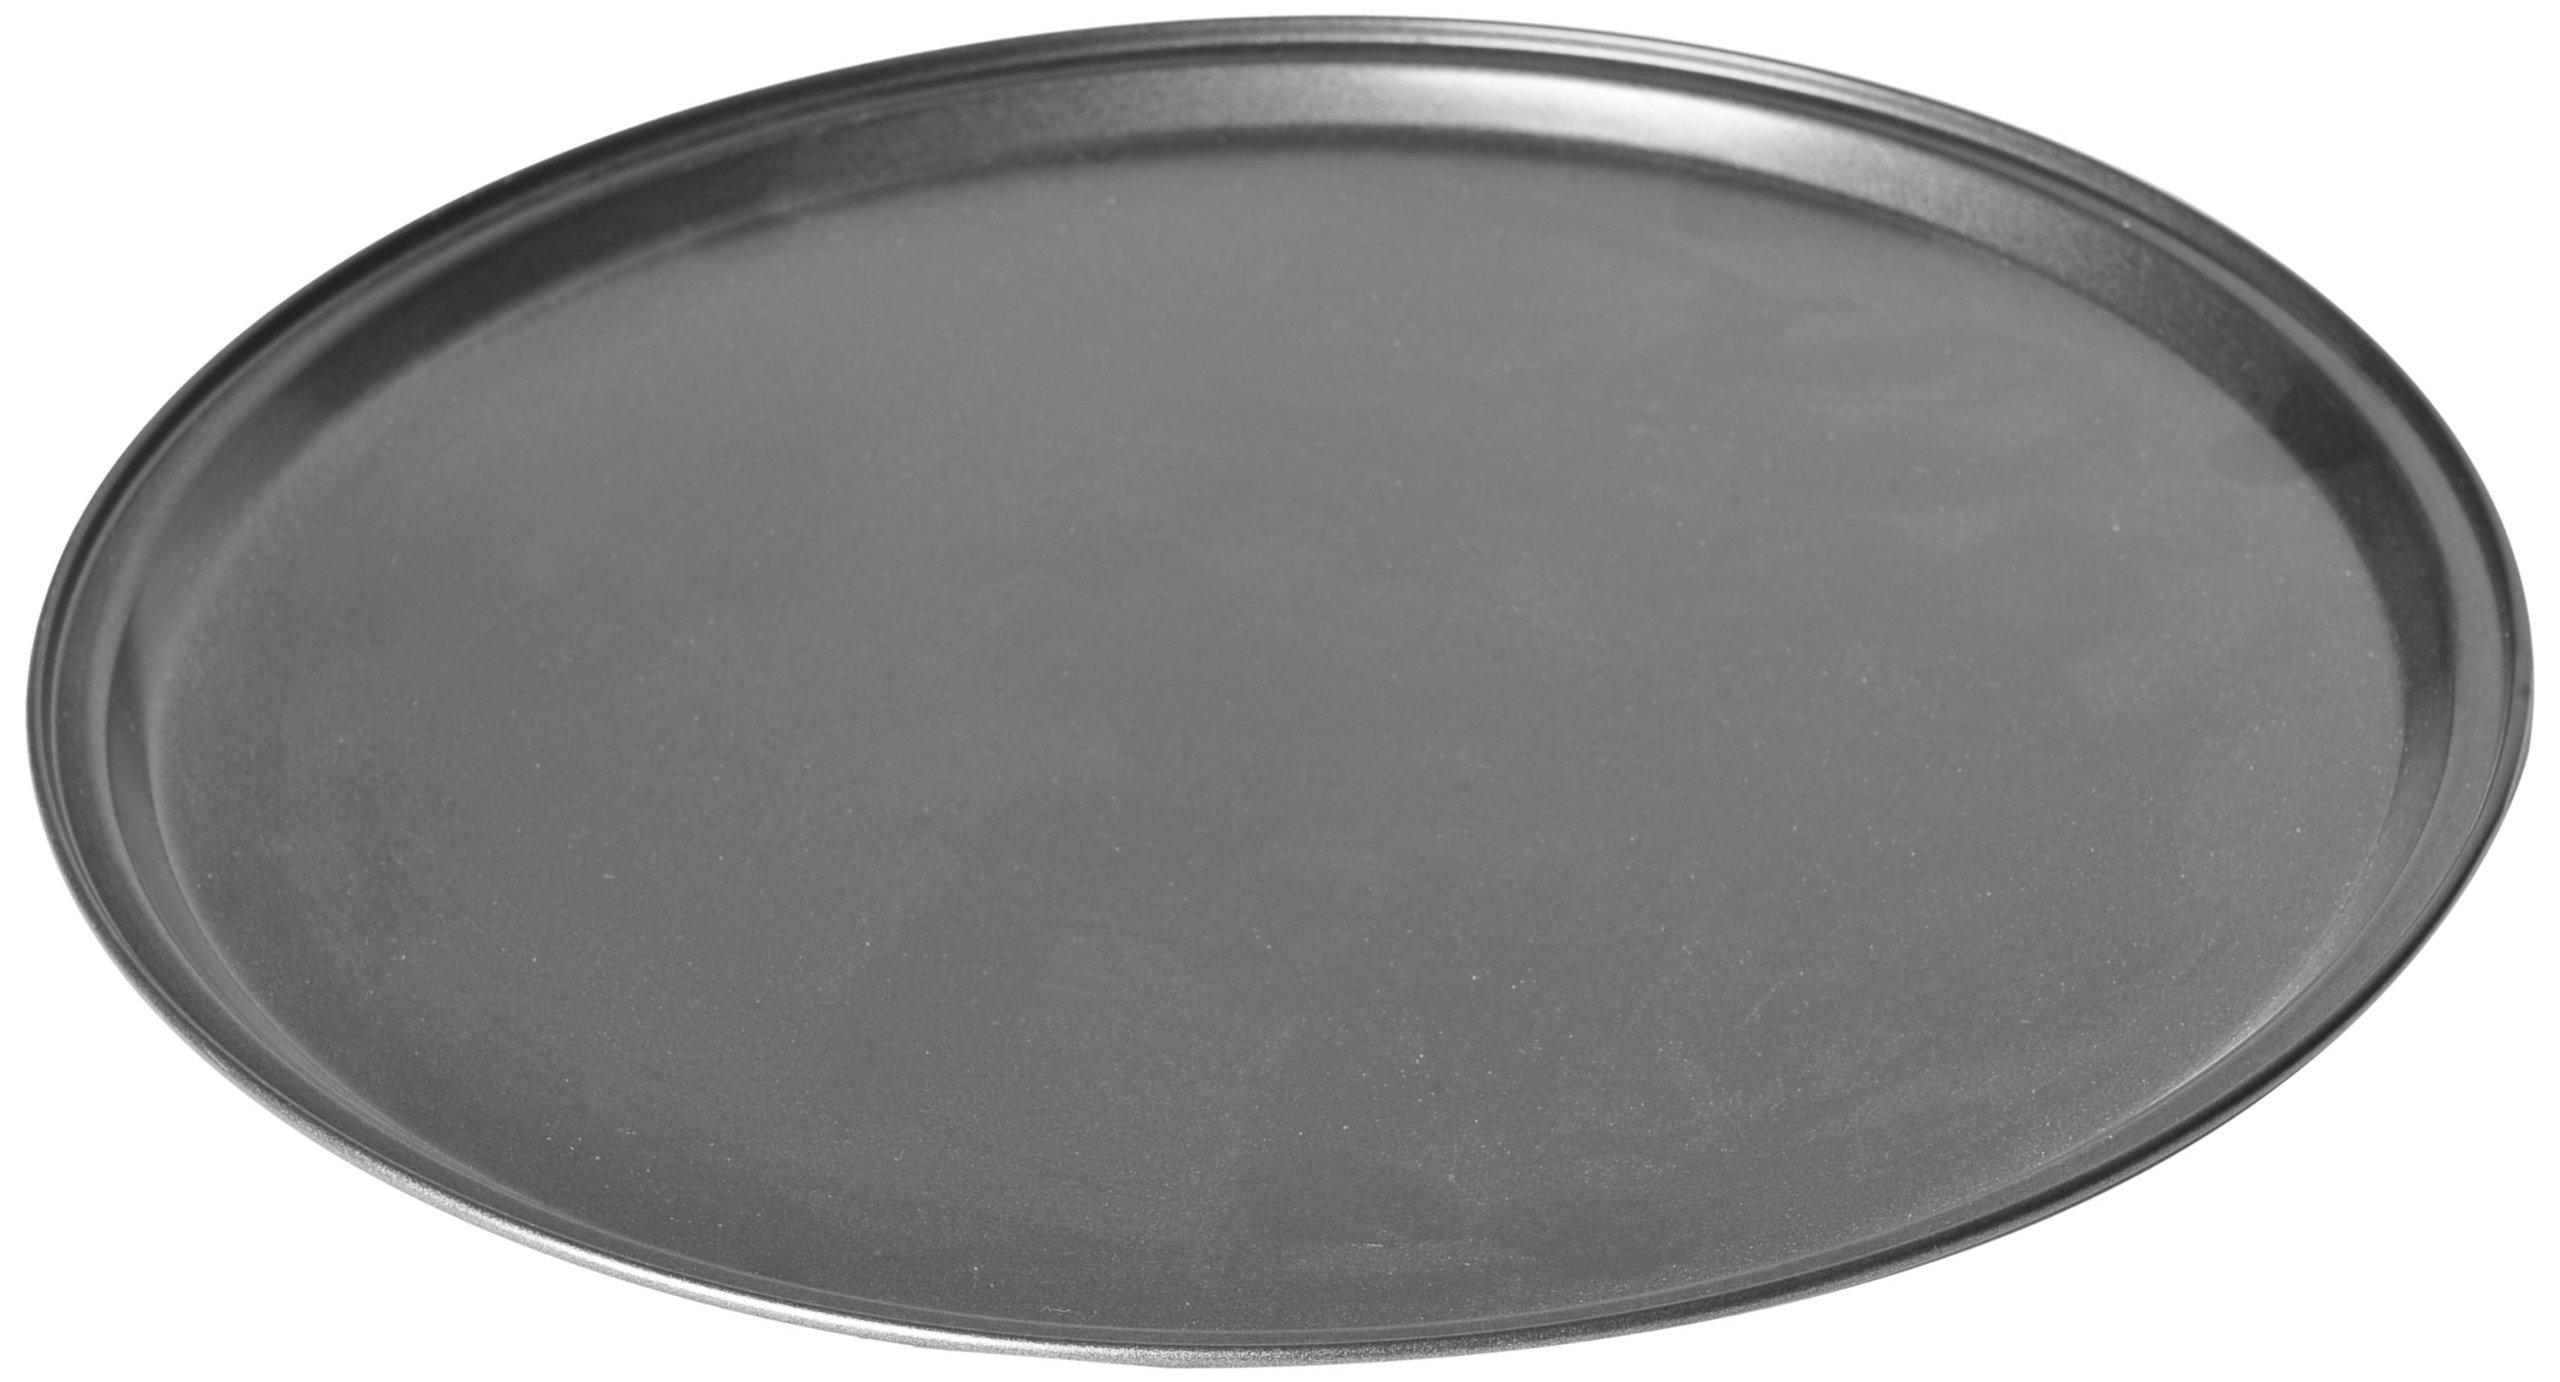 Chloe's Kitchen 201-122 11-Inch Pizza Pan, Full Bottom, Non-Stick by MDC Housewares Inc.